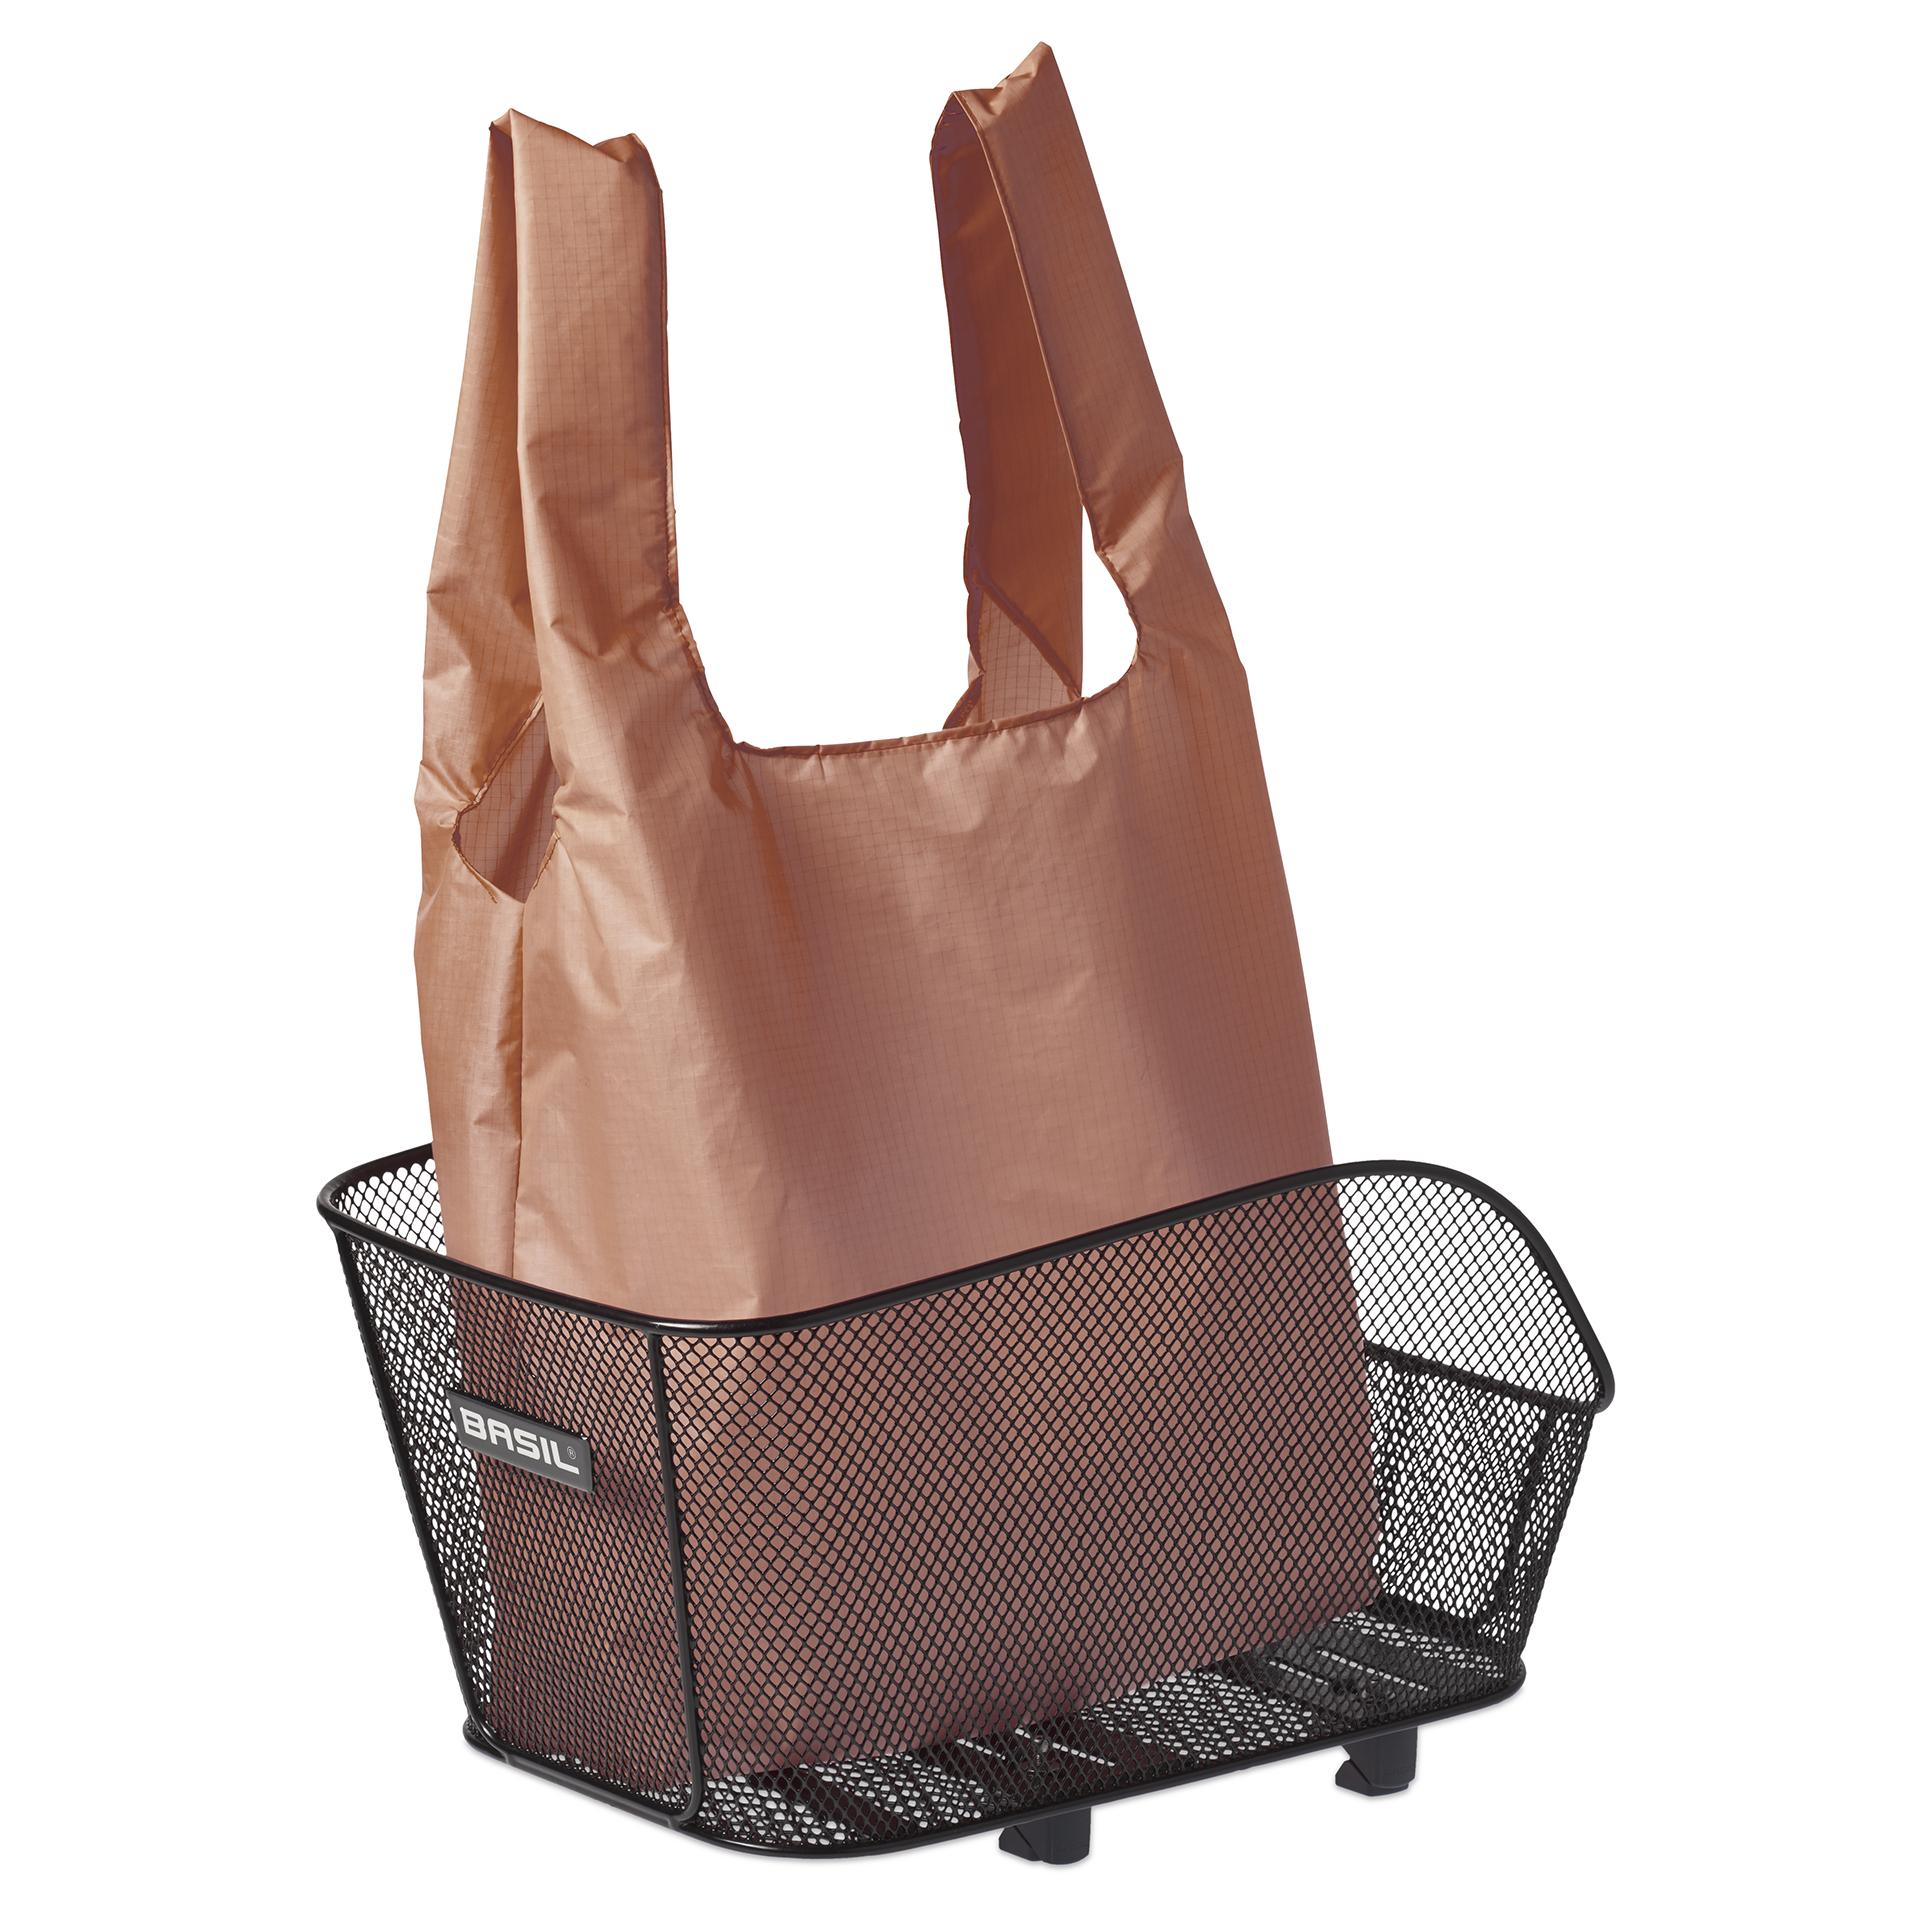 basil einkaufsbeutel f r metall fahrradkorb keep shopper. Black Bedroom Furniture Sets. Home Design Ideas